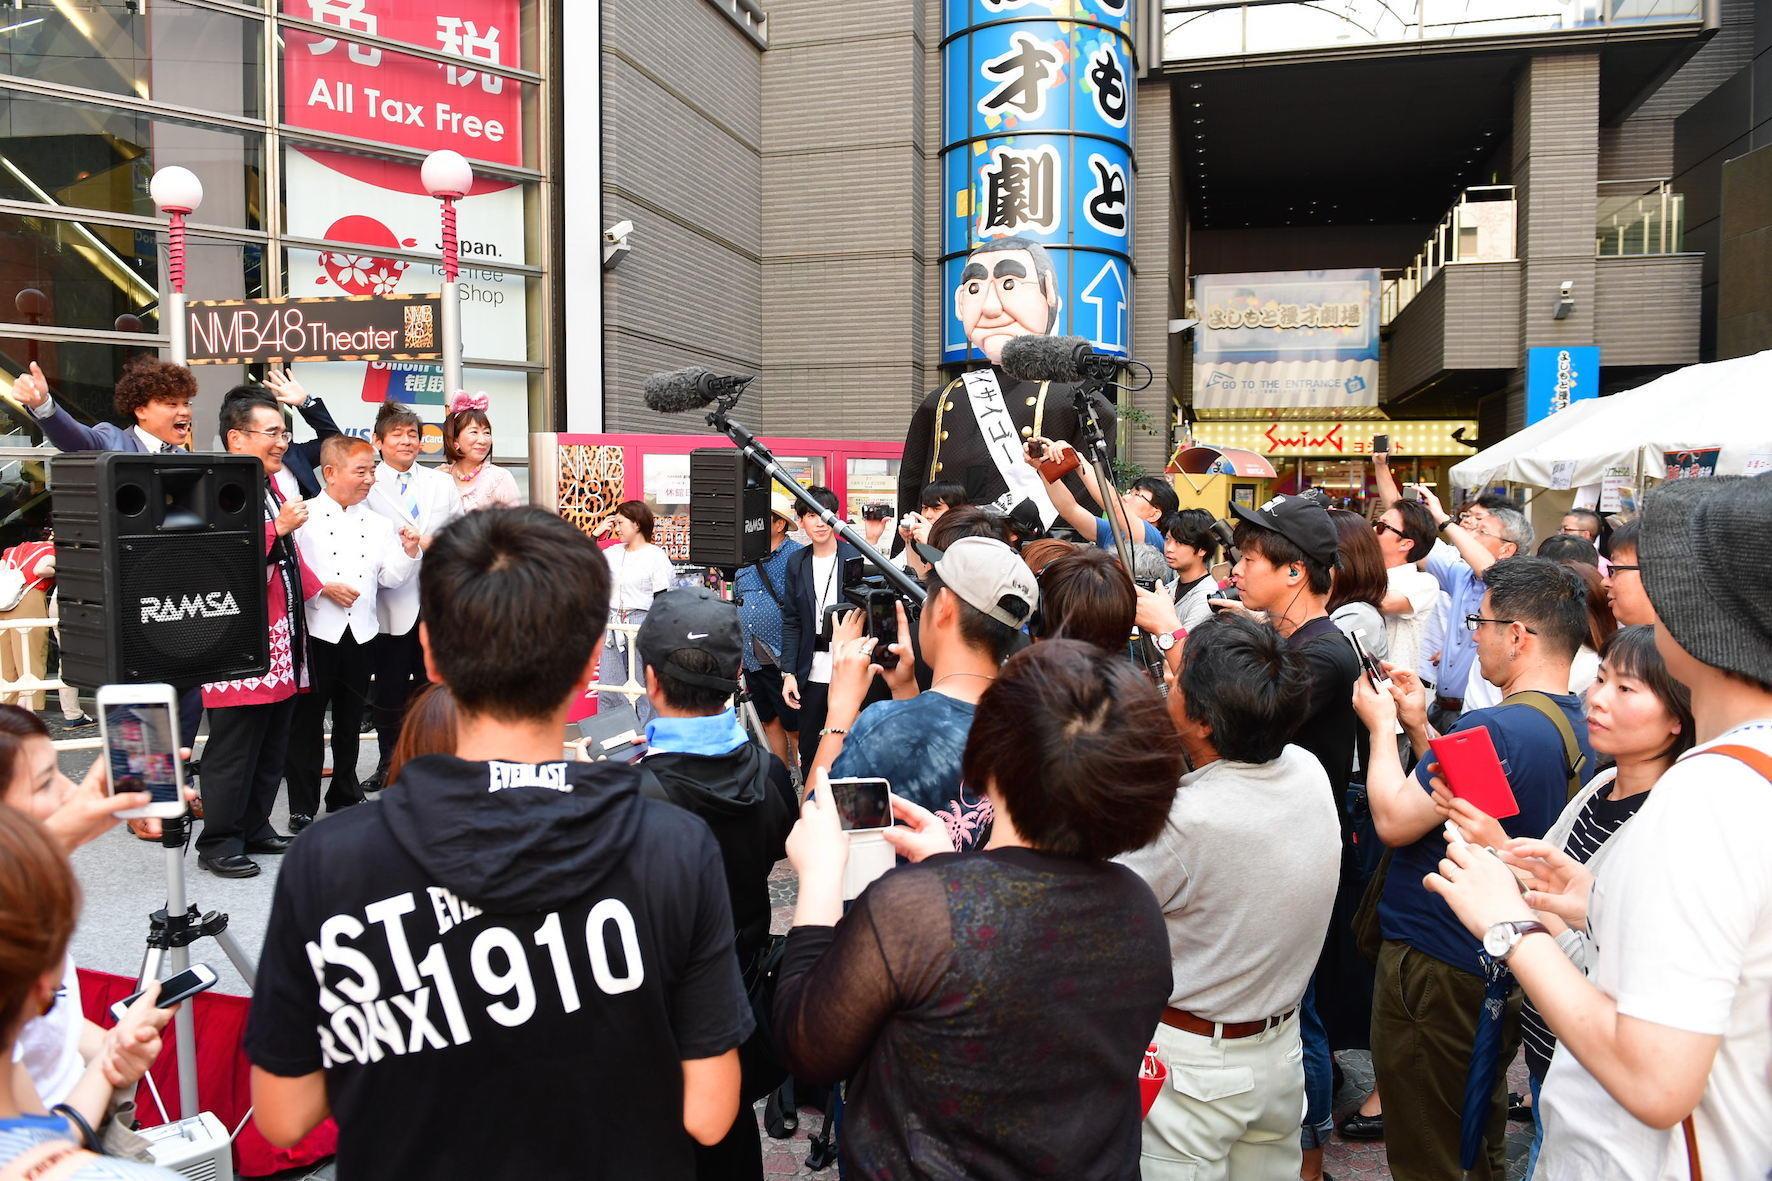 http://news.yoshimoto.co.jp/20180720190239-9029582460aa8162f579388c951a817491e83160.jpg